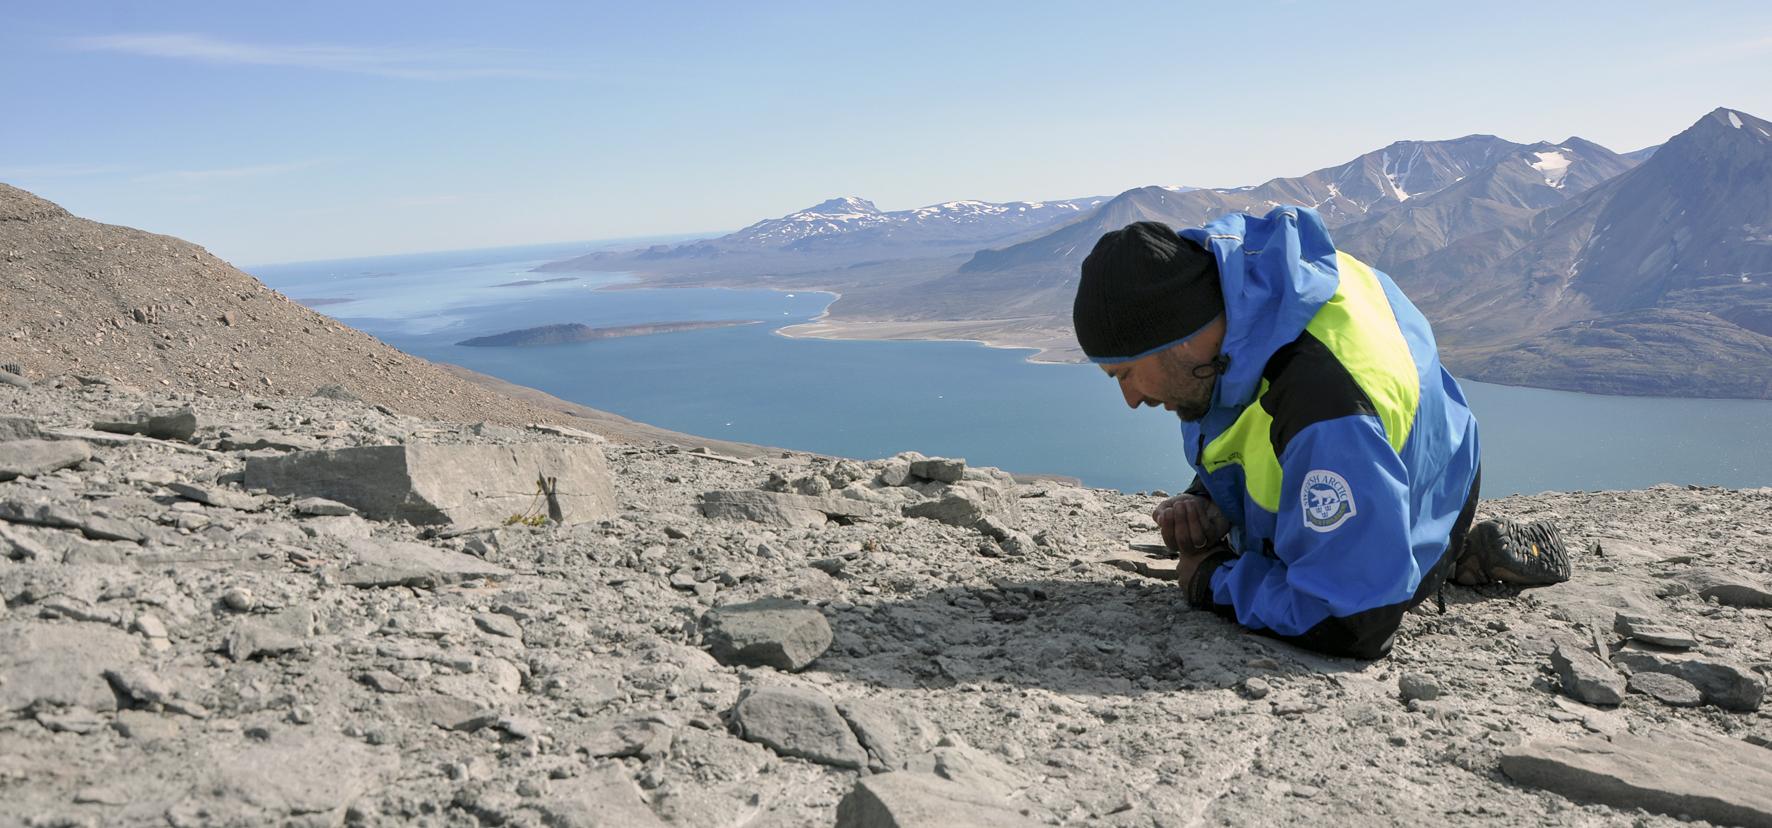 Searching for Ichthyostega bone fragments near the summit of Celsius Bjerg. Photo: Benjamin Kear